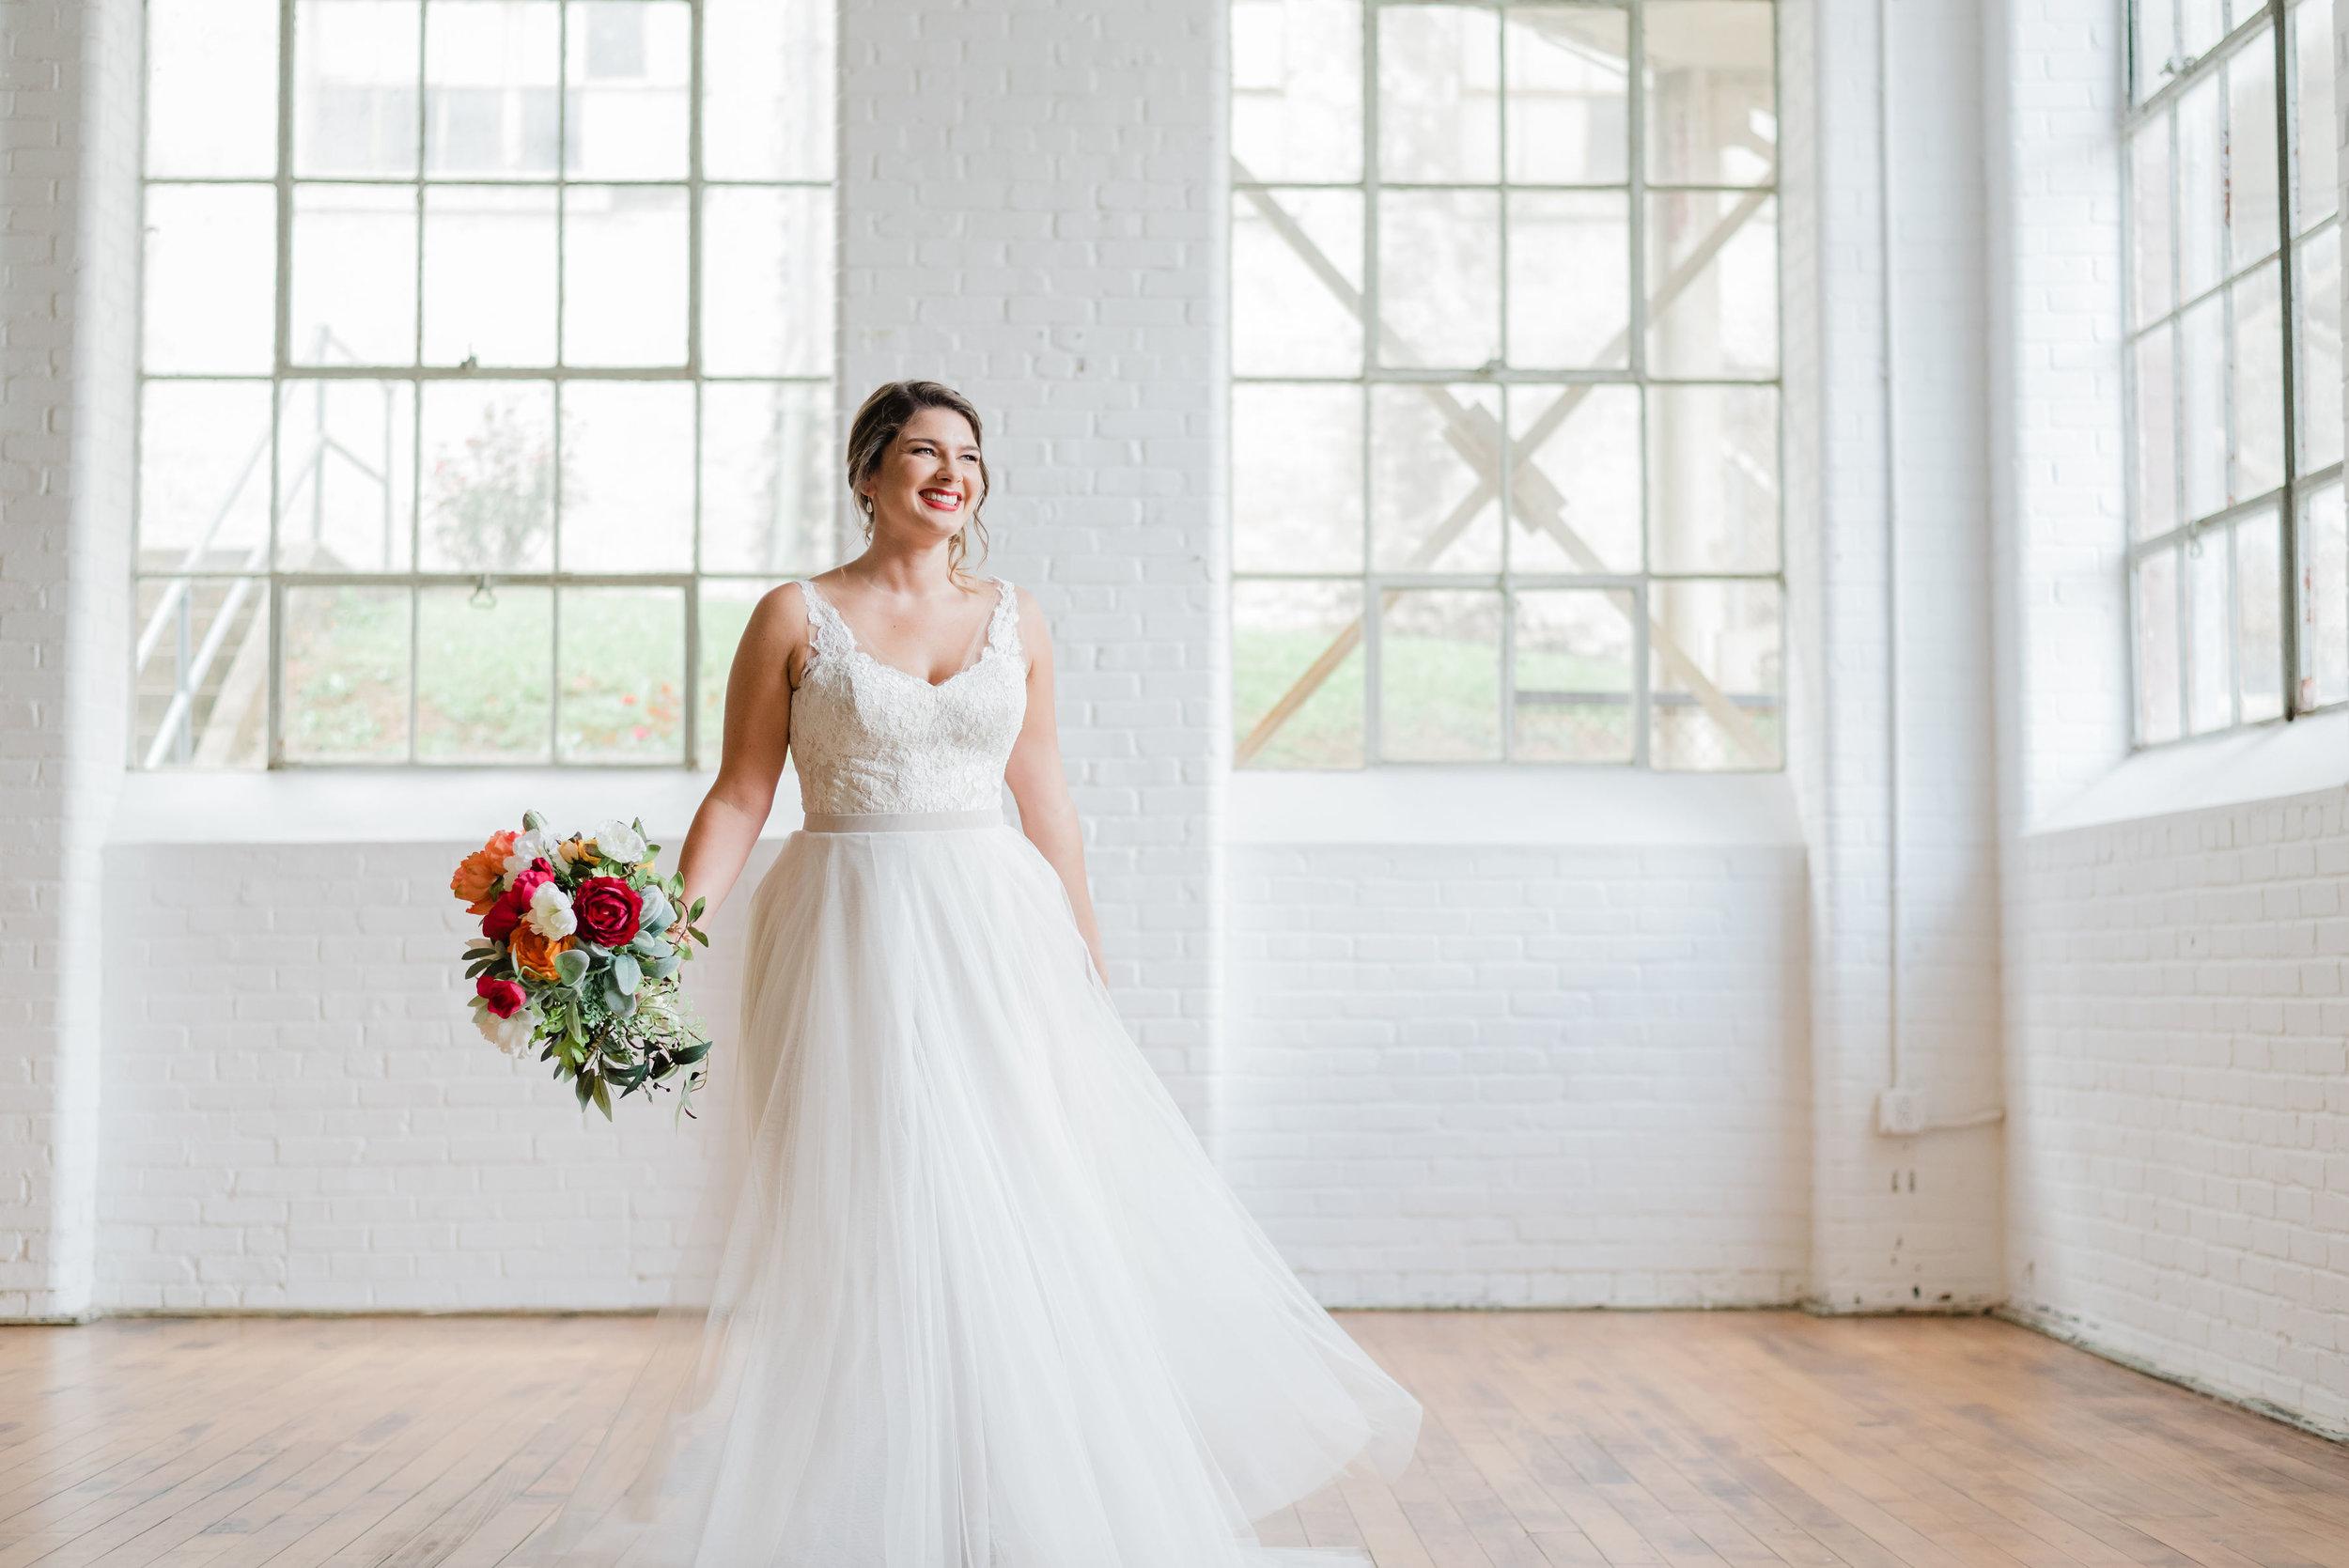 TaylorAdams_bridals-17.jpg